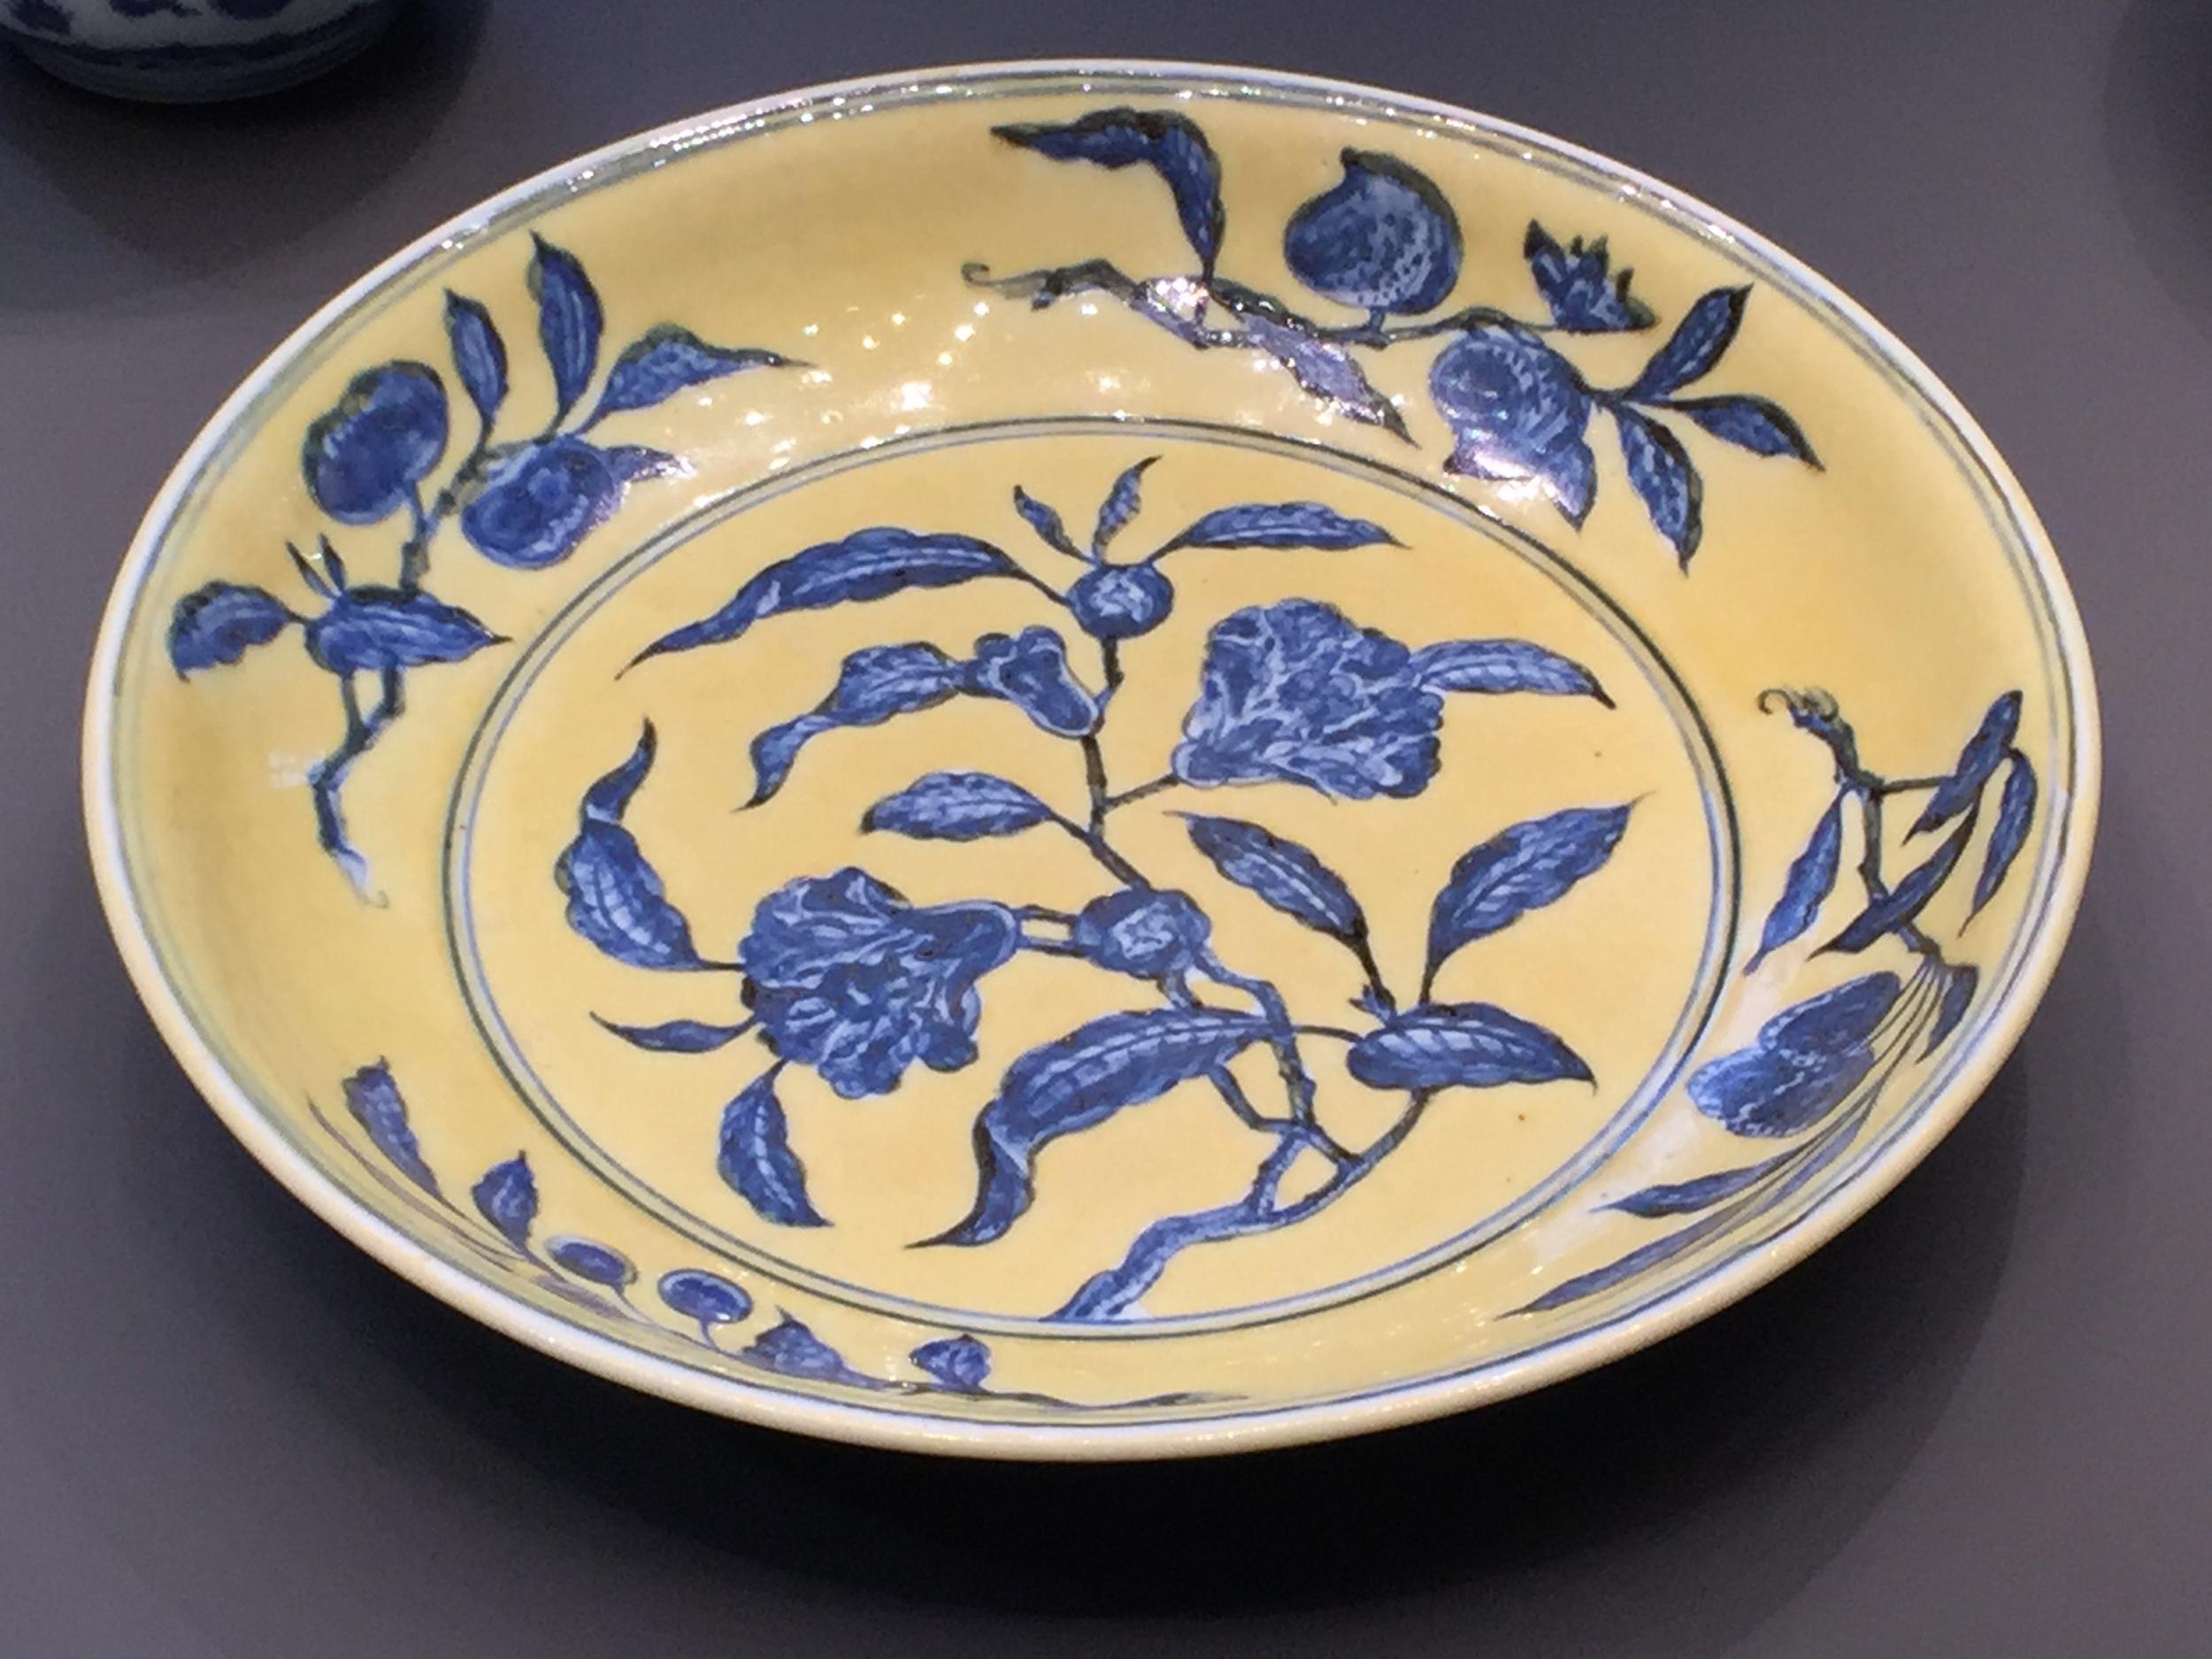 Chinese-Porcelain-British-Museum-Percival-David-jessewaugh.com-65.jpg